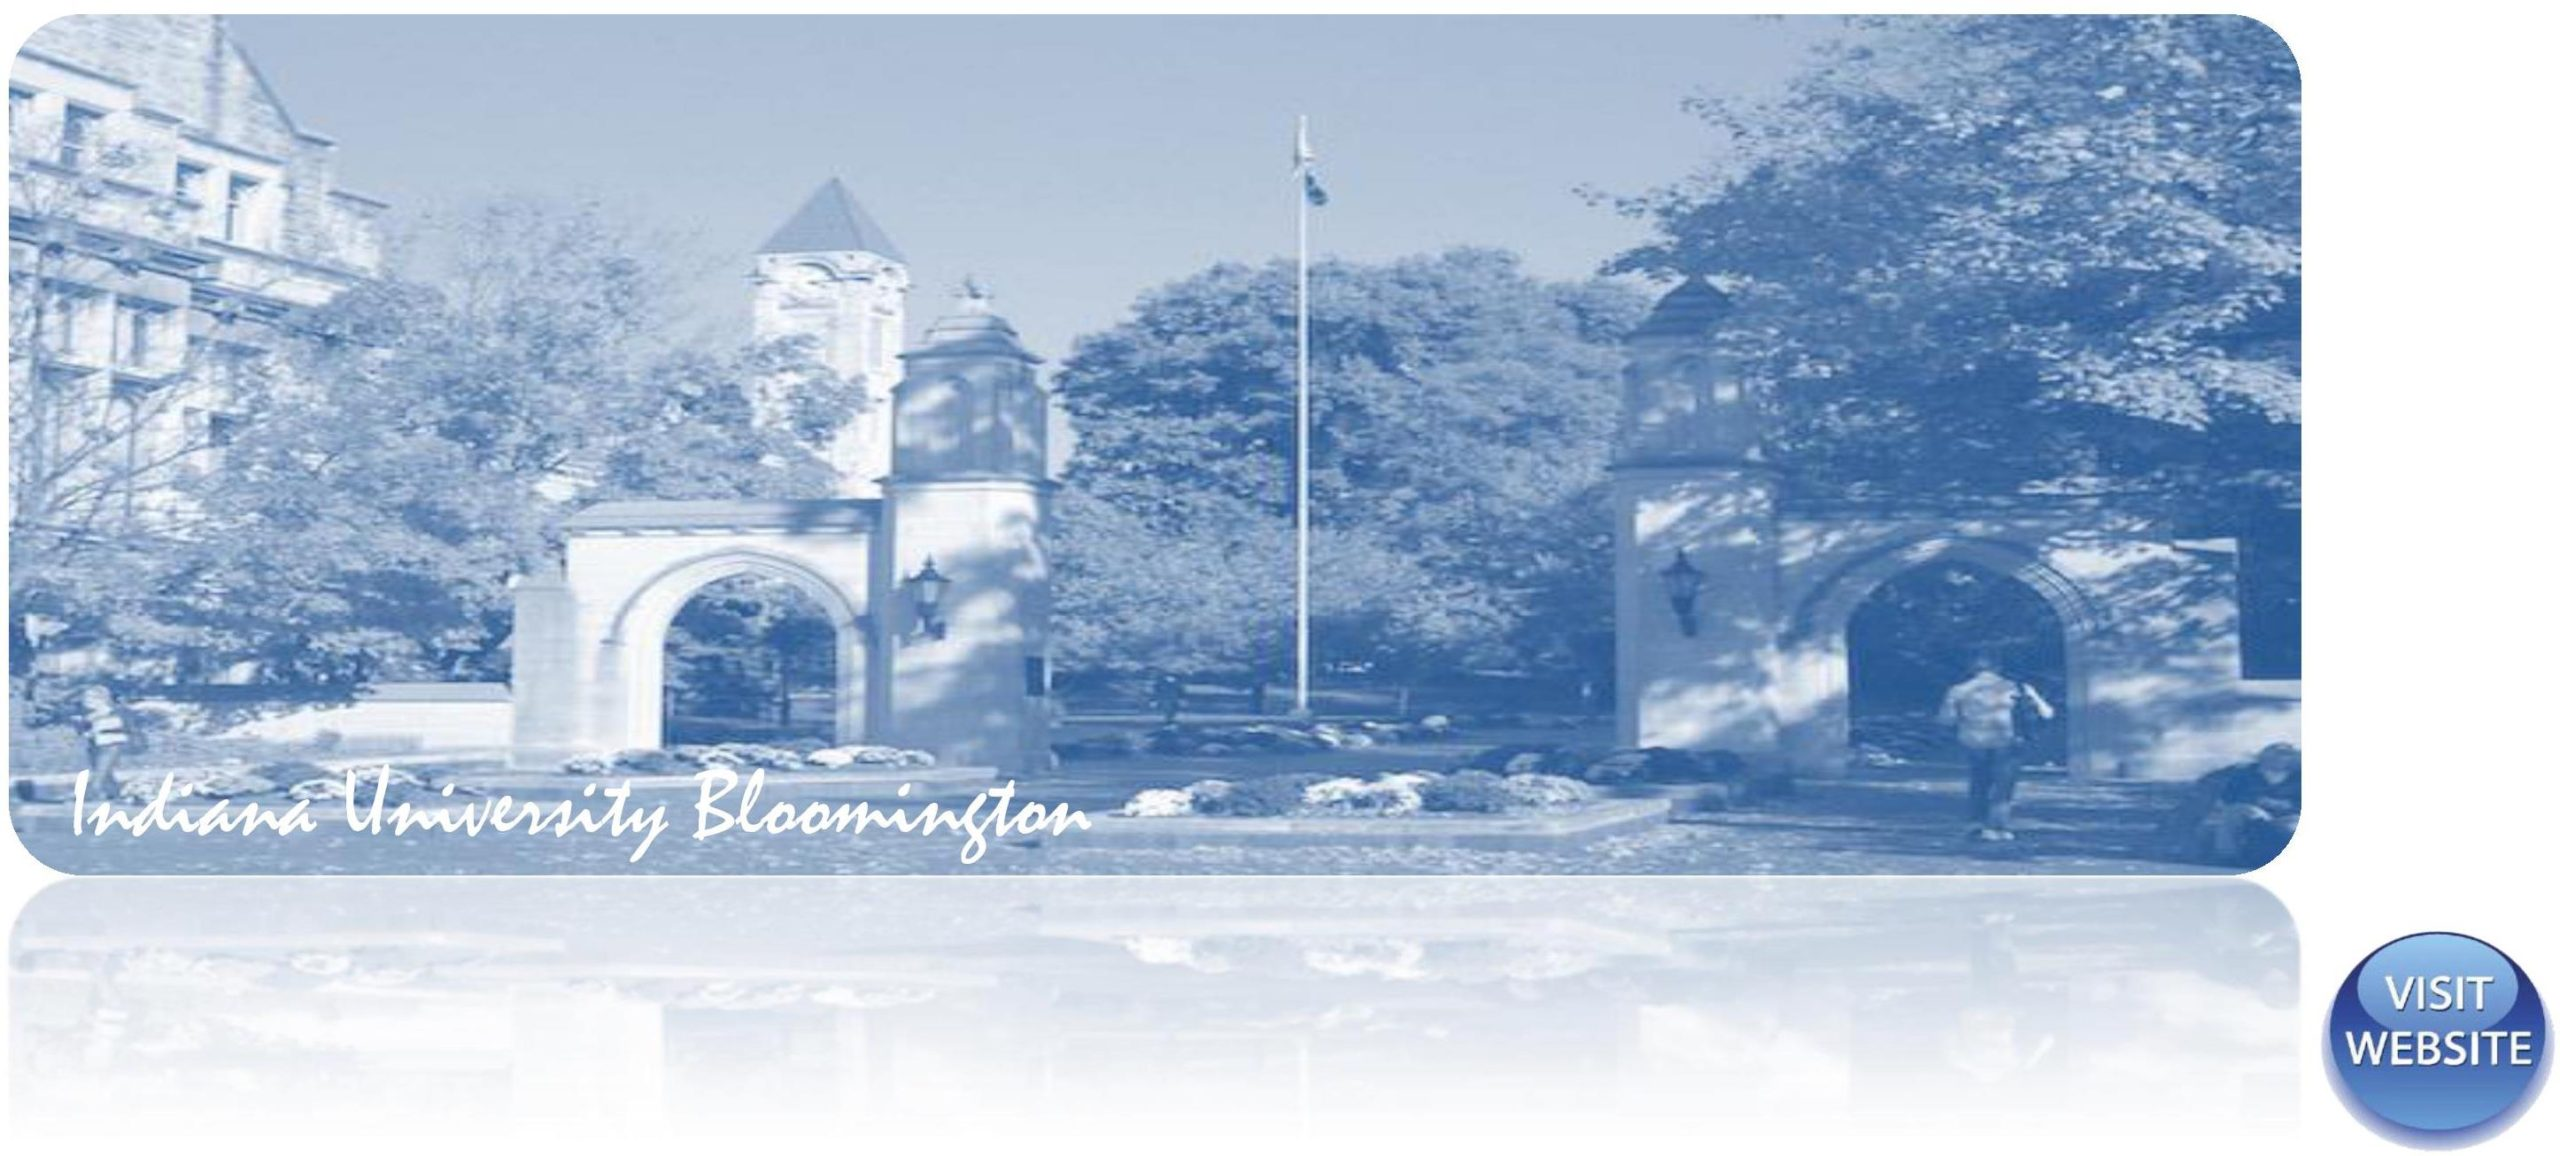 Indiana University Bloomington USA